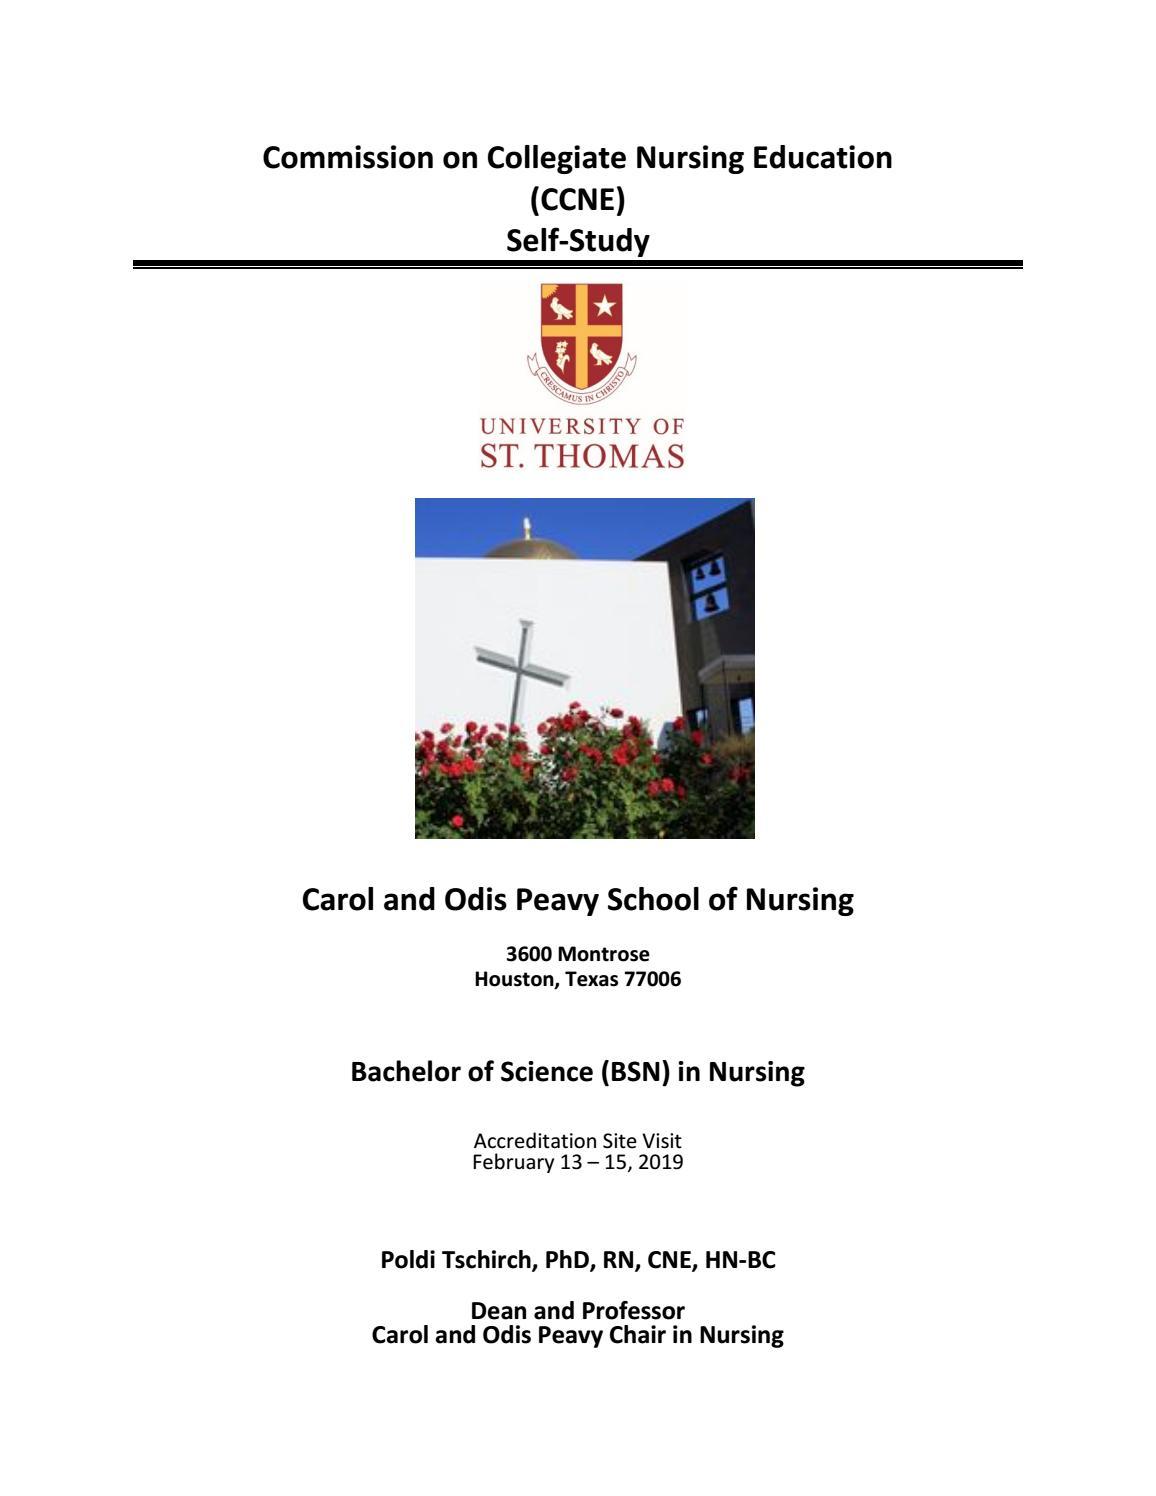 UST Carol and Odis Peavy School of Nursing CCNE Self-Study by